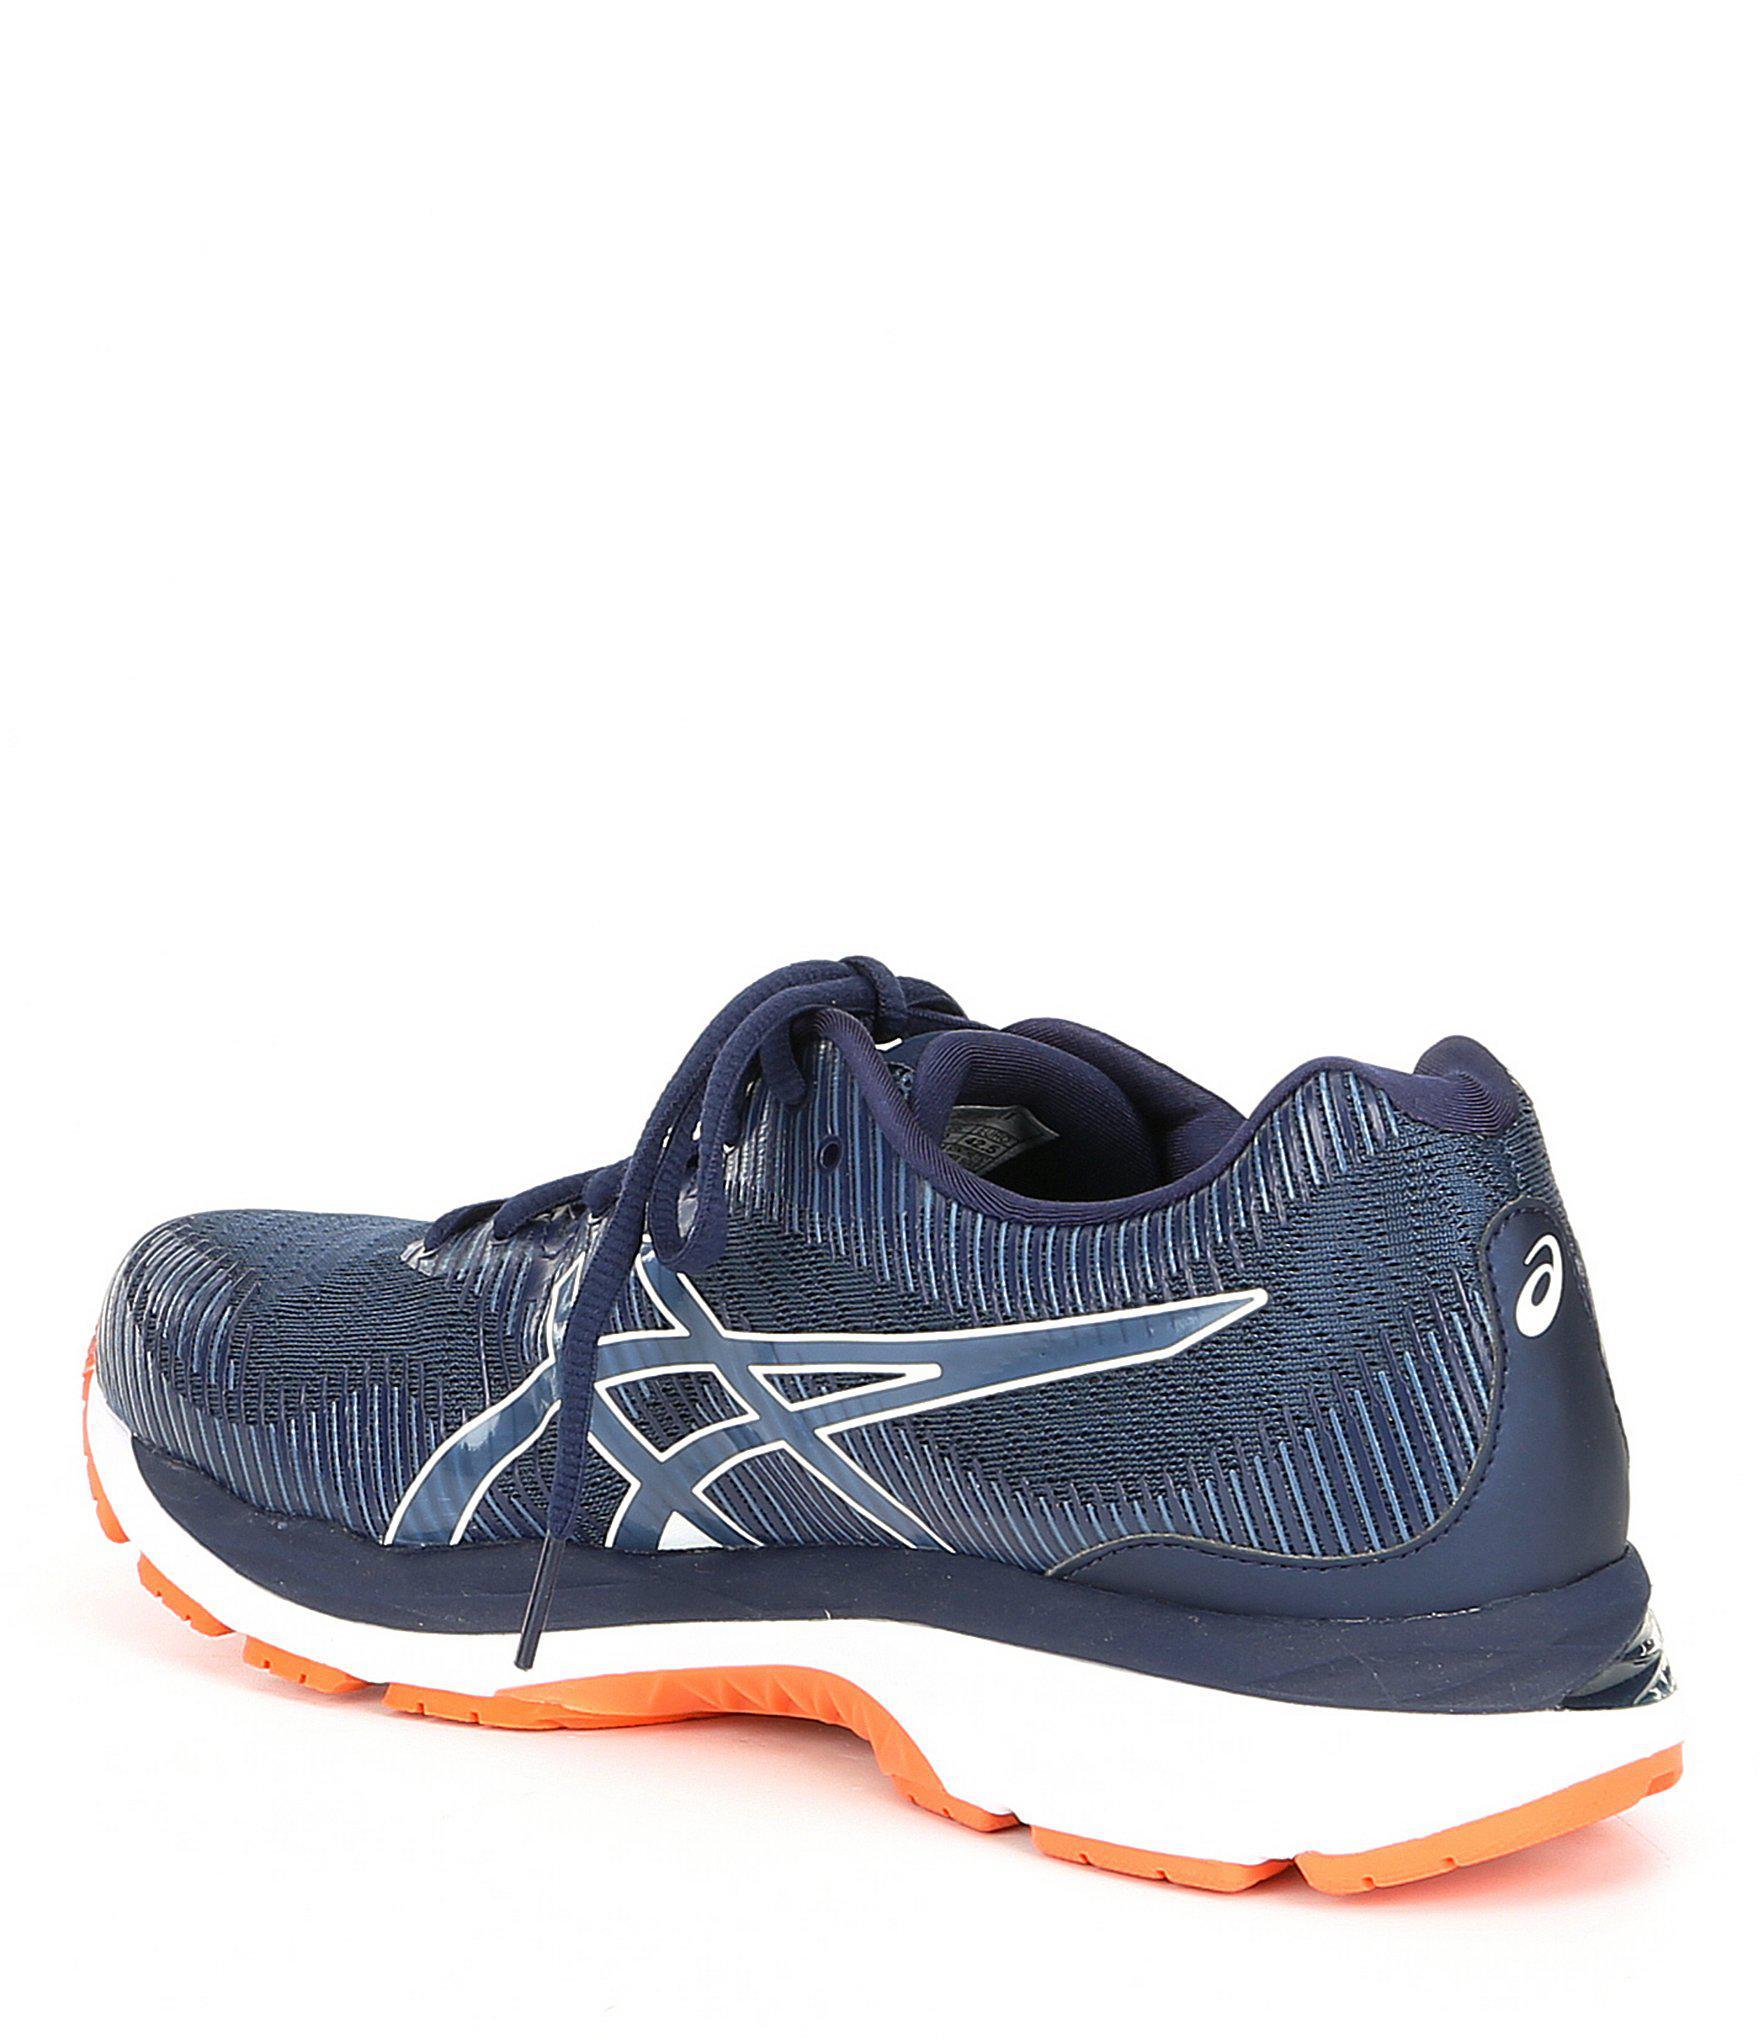 86273550f6 Asics - Blue Men's Gel-ziruss 2 Running Shoe for Men - Lyst. View fullscreen